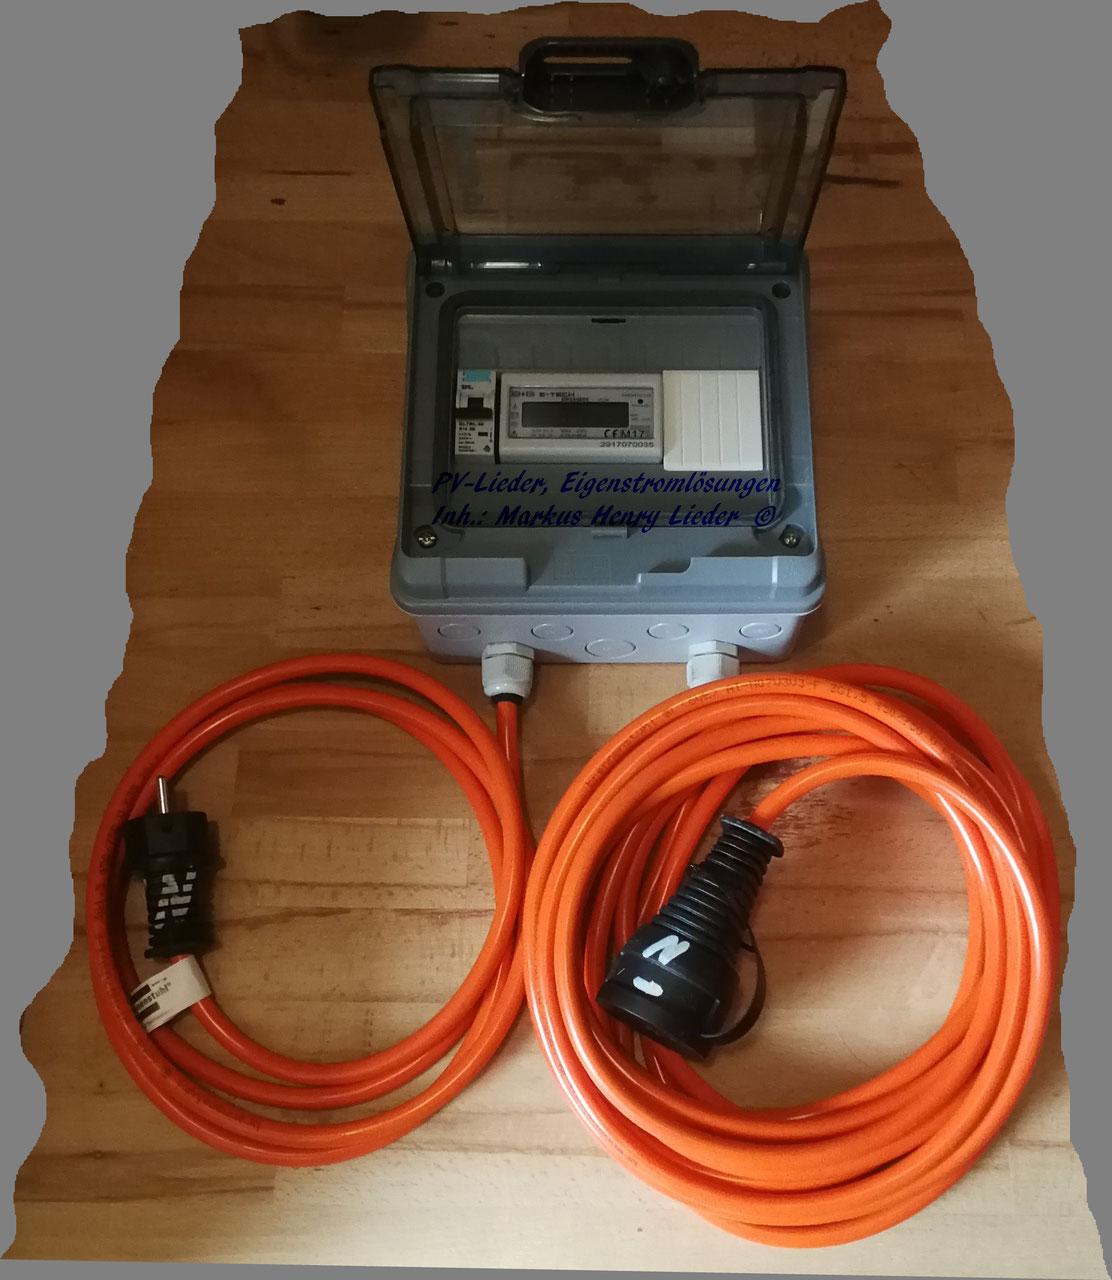 PV-Lieder-Shop: Photovoltaik - Plug & Play Solar - PV-Lieder ...